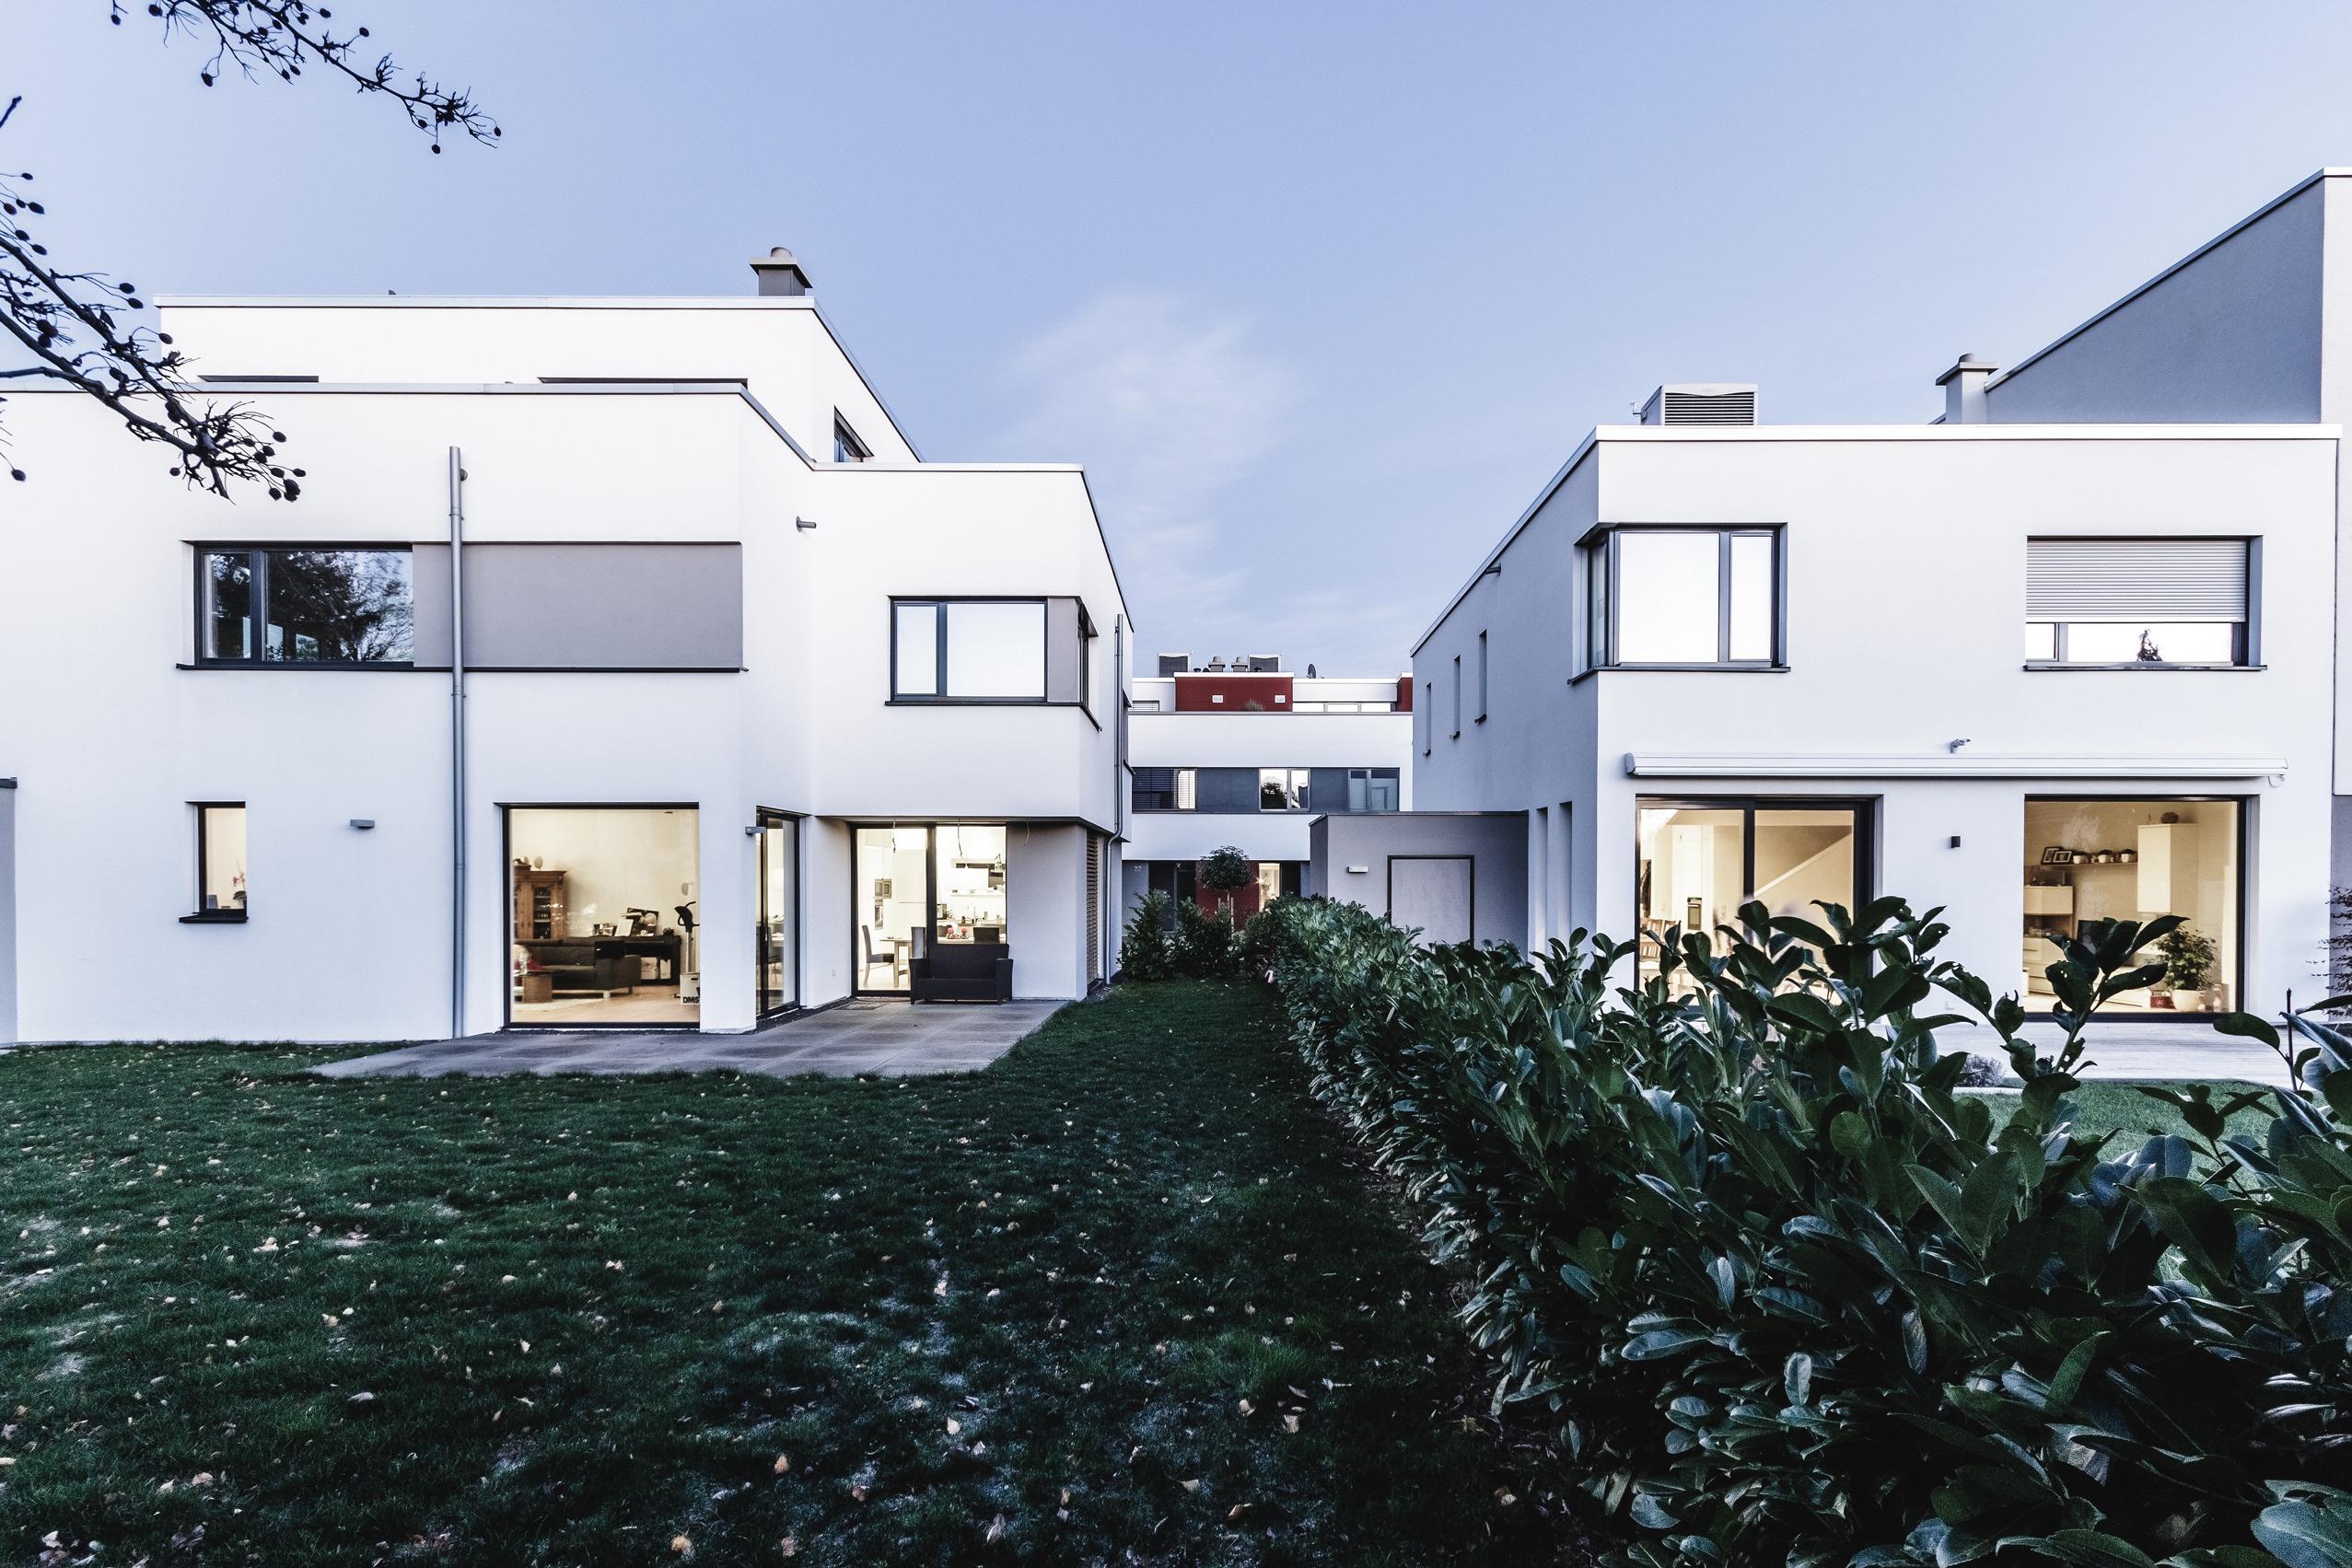 Putzfassade - Bellevue 2.0